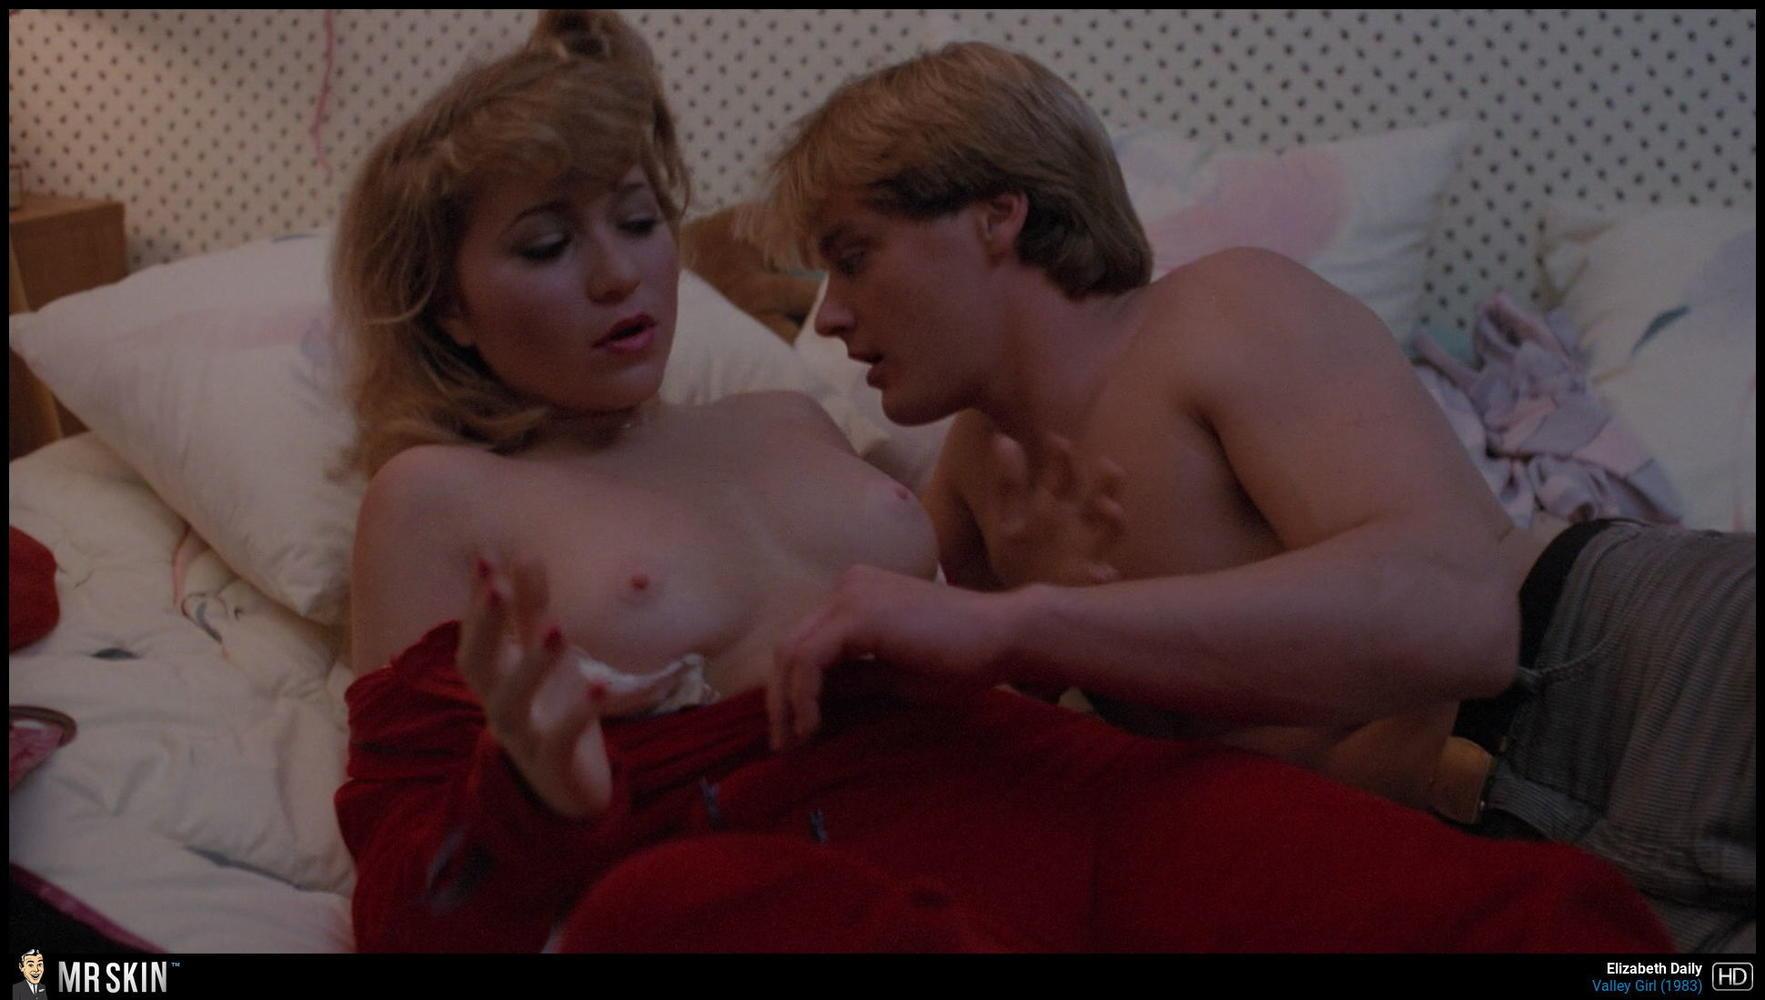 Angela Covello Nude skincoming on dvd and blu-ray: valley girl, torso, and more